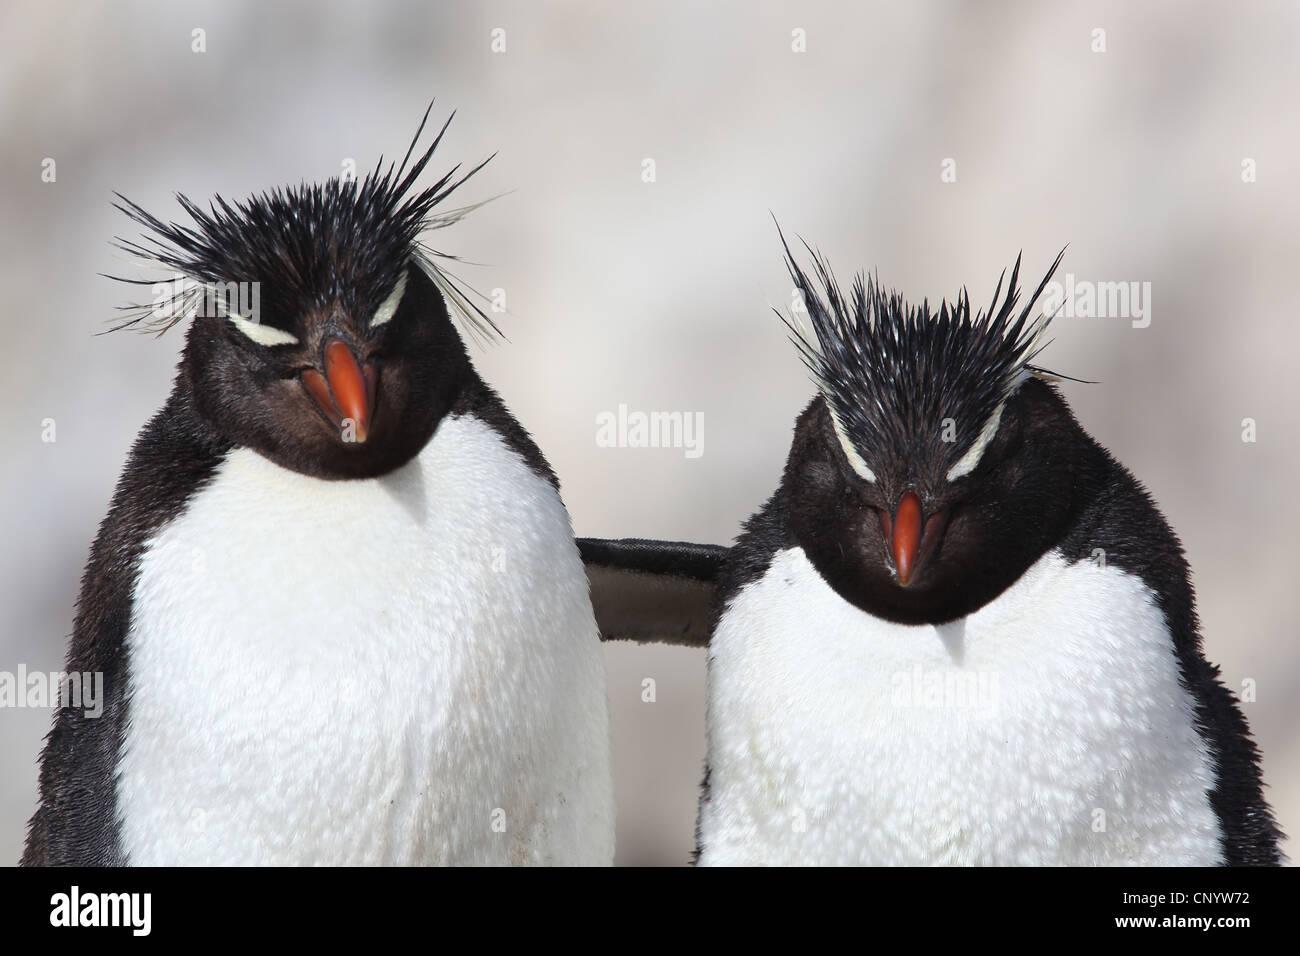 Felsenpinguin (Eudyptes Chrysocome), umarmen, Argentinien, Penguin Island Stockfoto